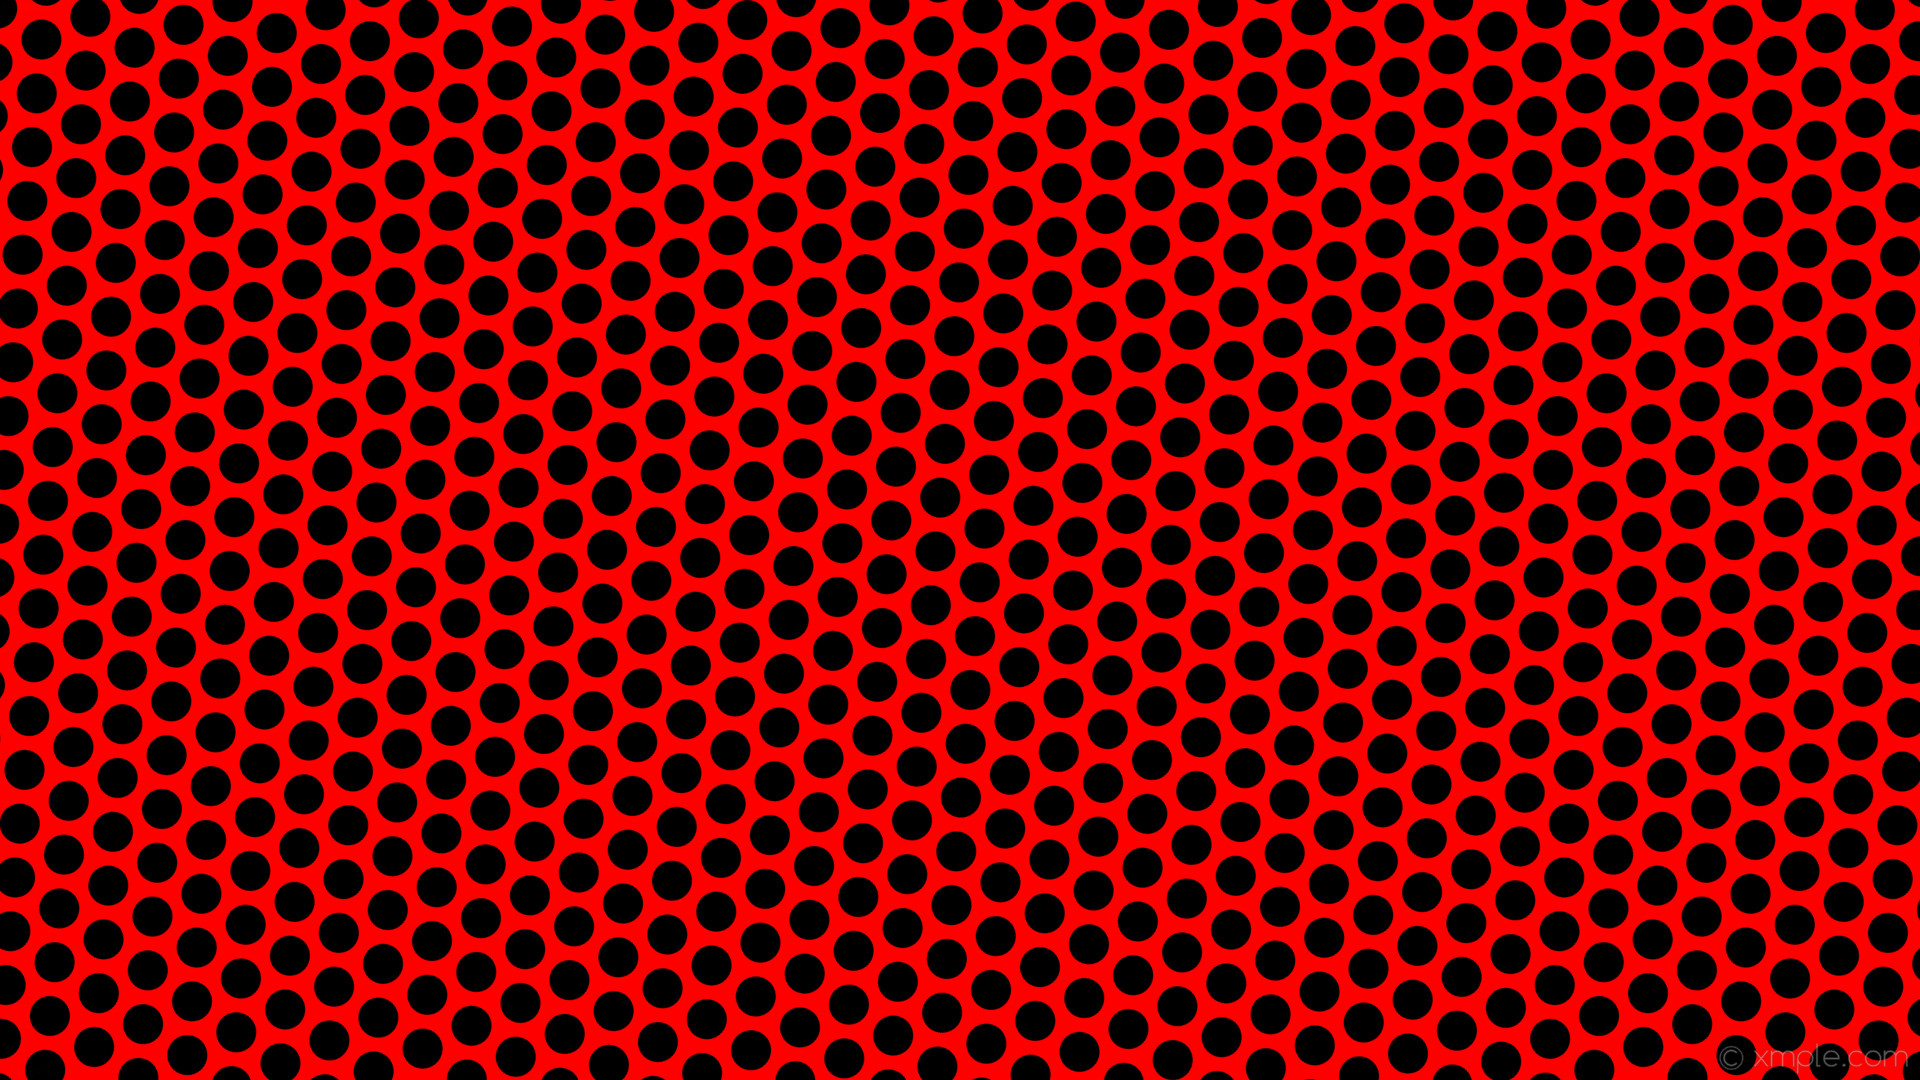 wallpaper dots polka red black hexagon #ff0000 #000000 diagonal 25° 40px  54px